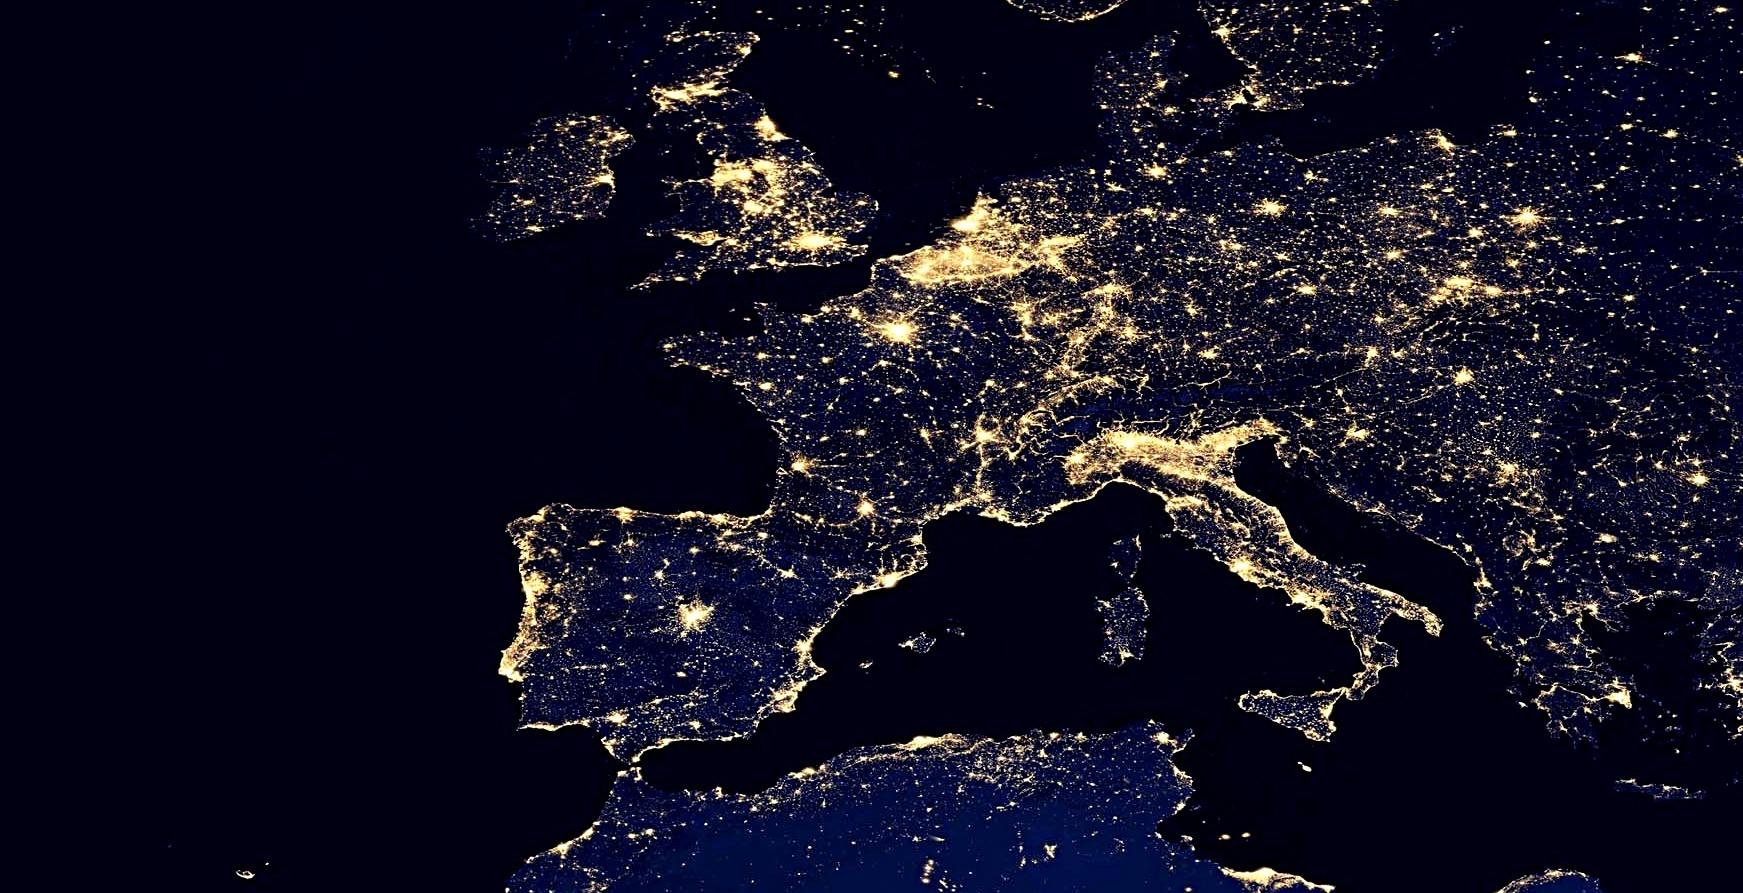 L'Europe la nuit